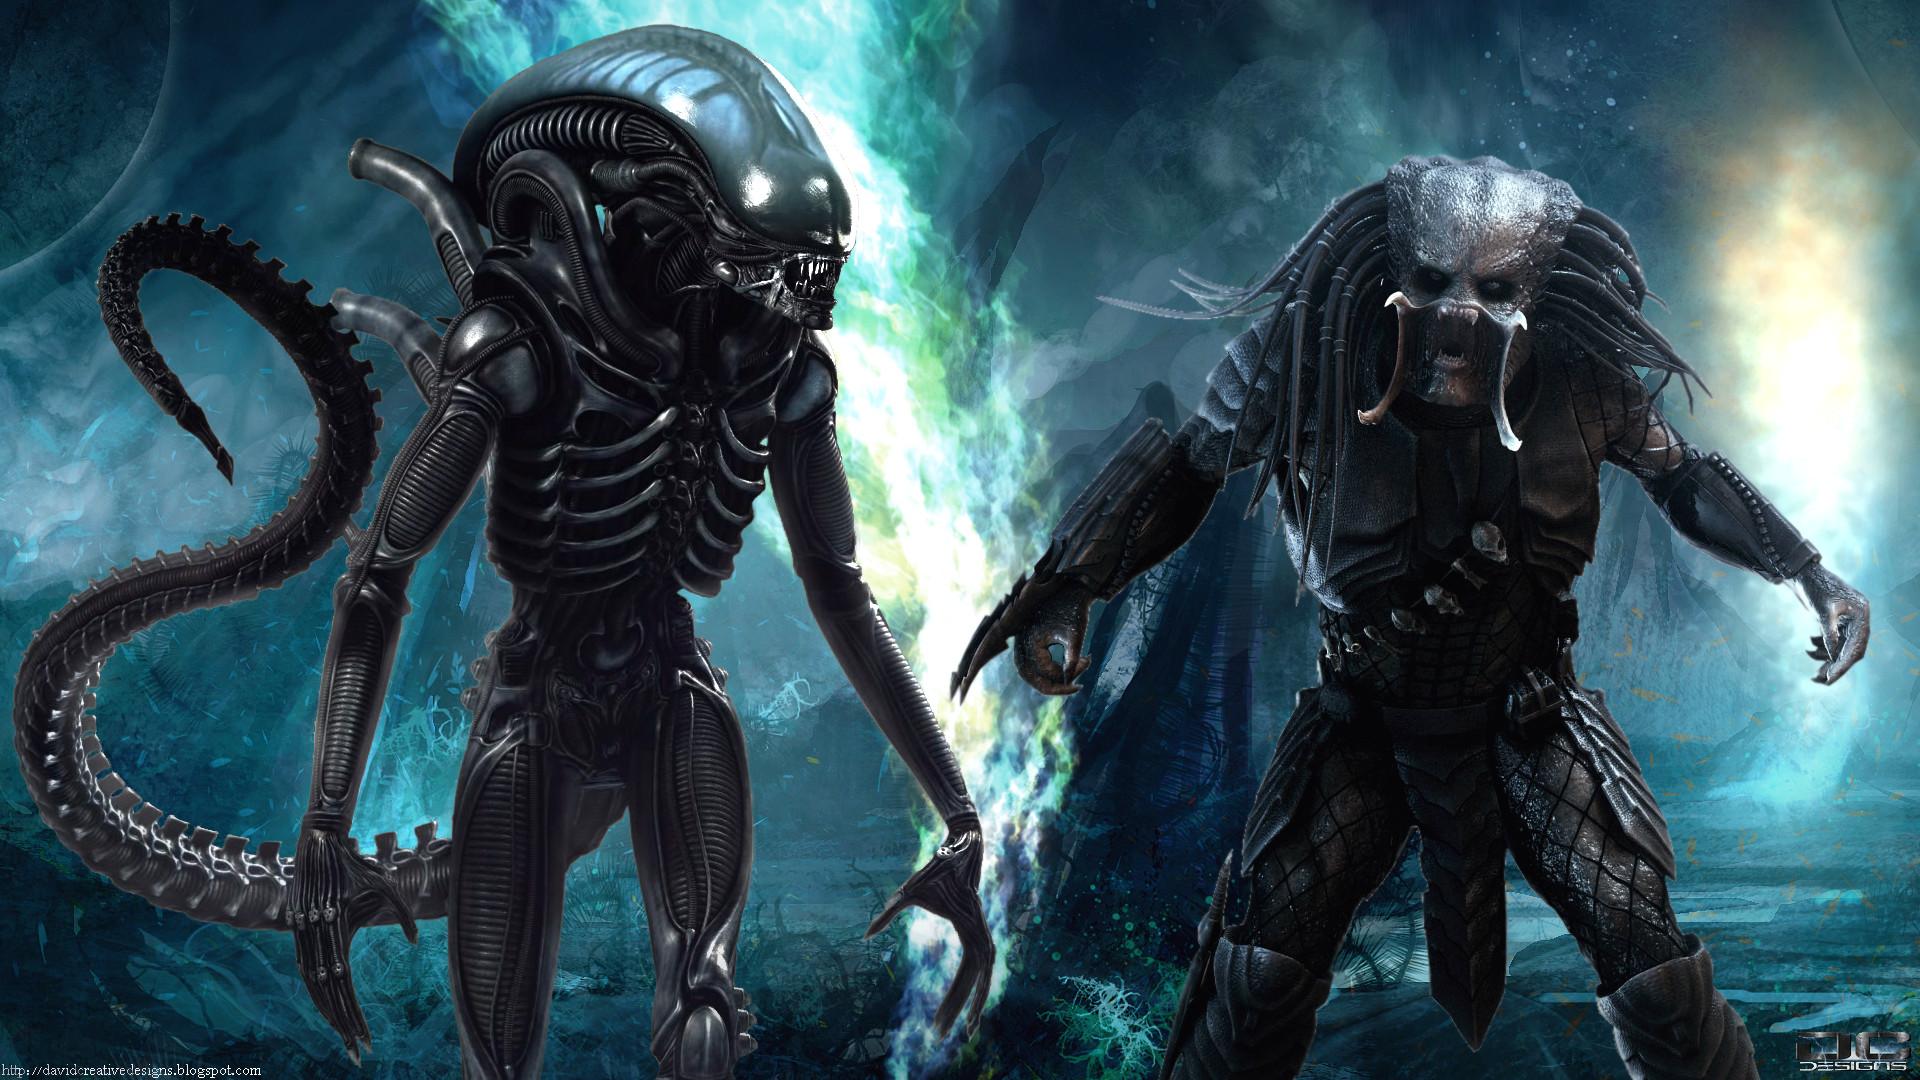 2048x1536 Download The Alien Vs Predator Hyabusa Wallpaper IPhone